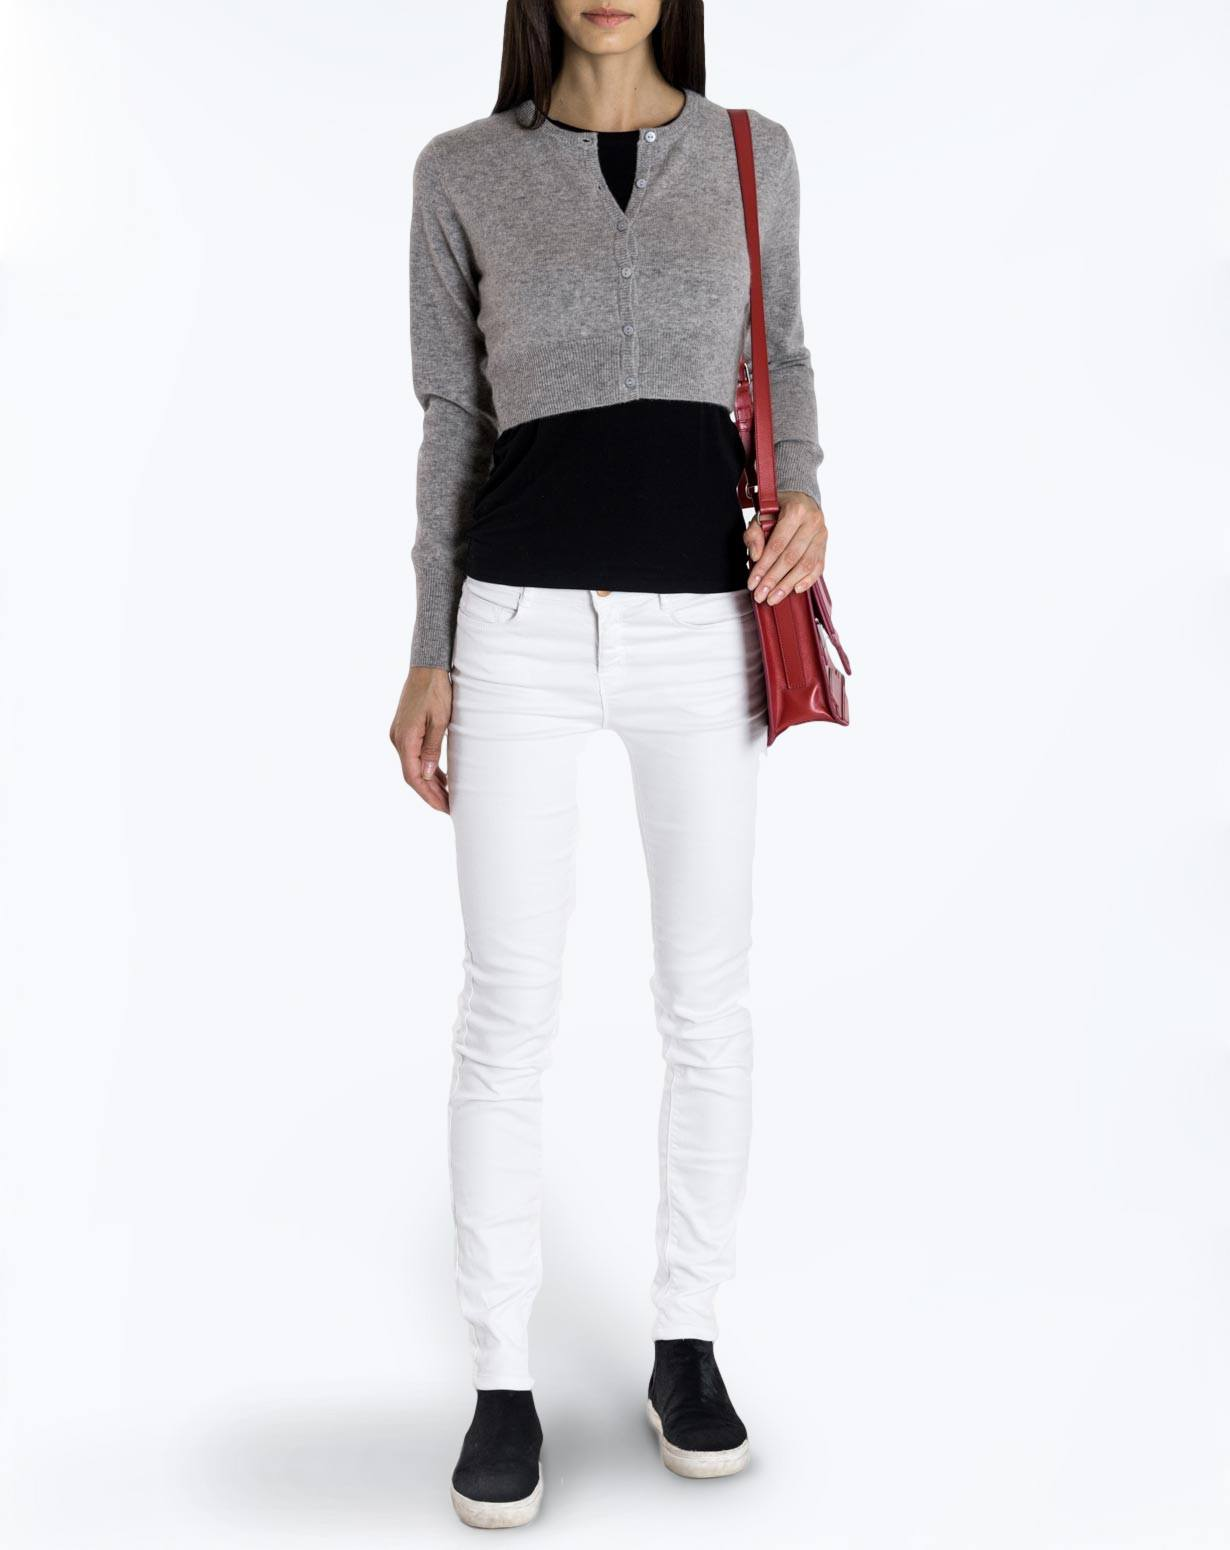 Women's Pure Cashmere Cropped Cardigan | MaisonCashmere